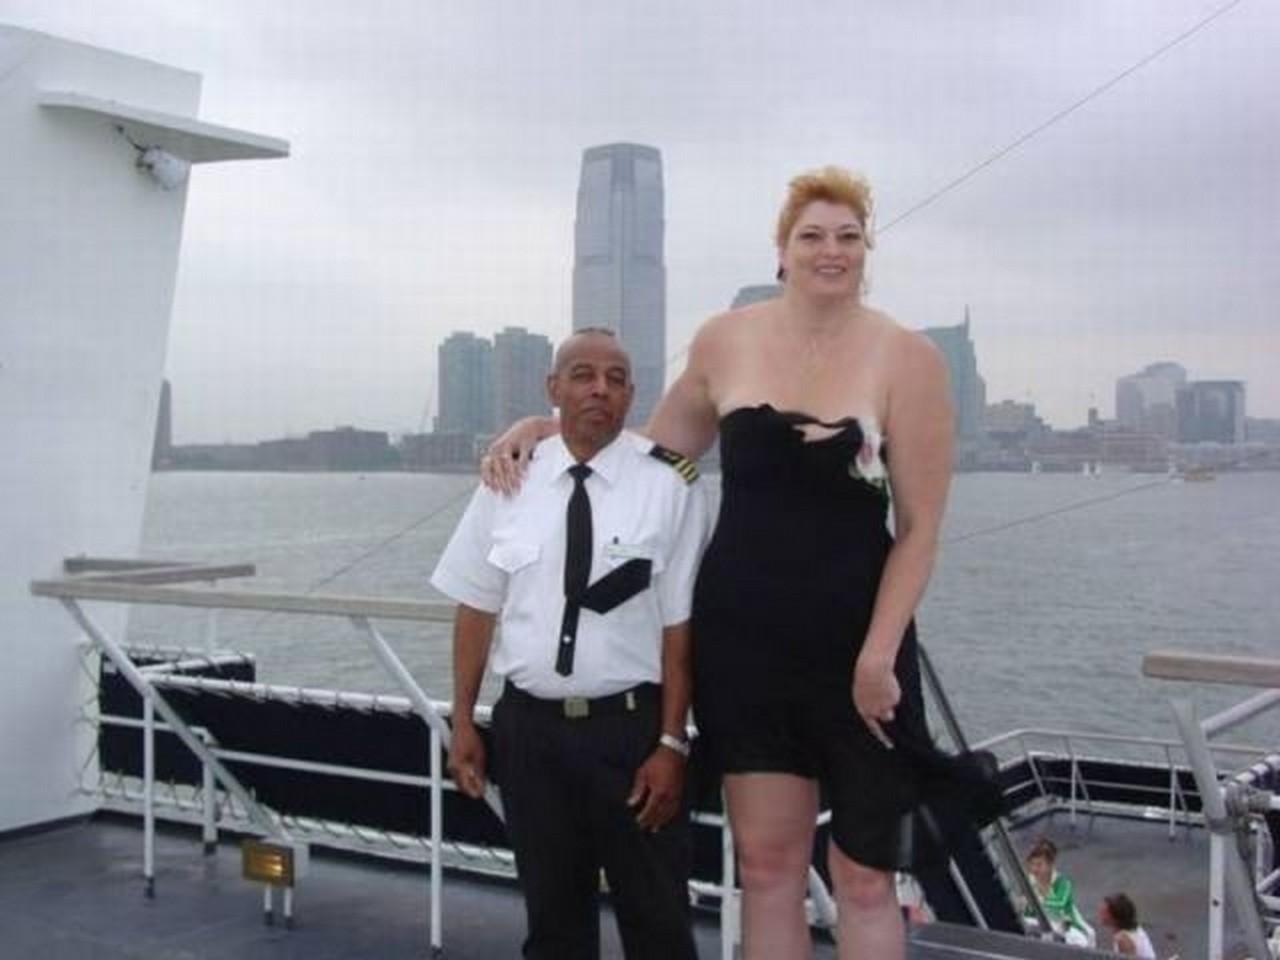 tall fat person